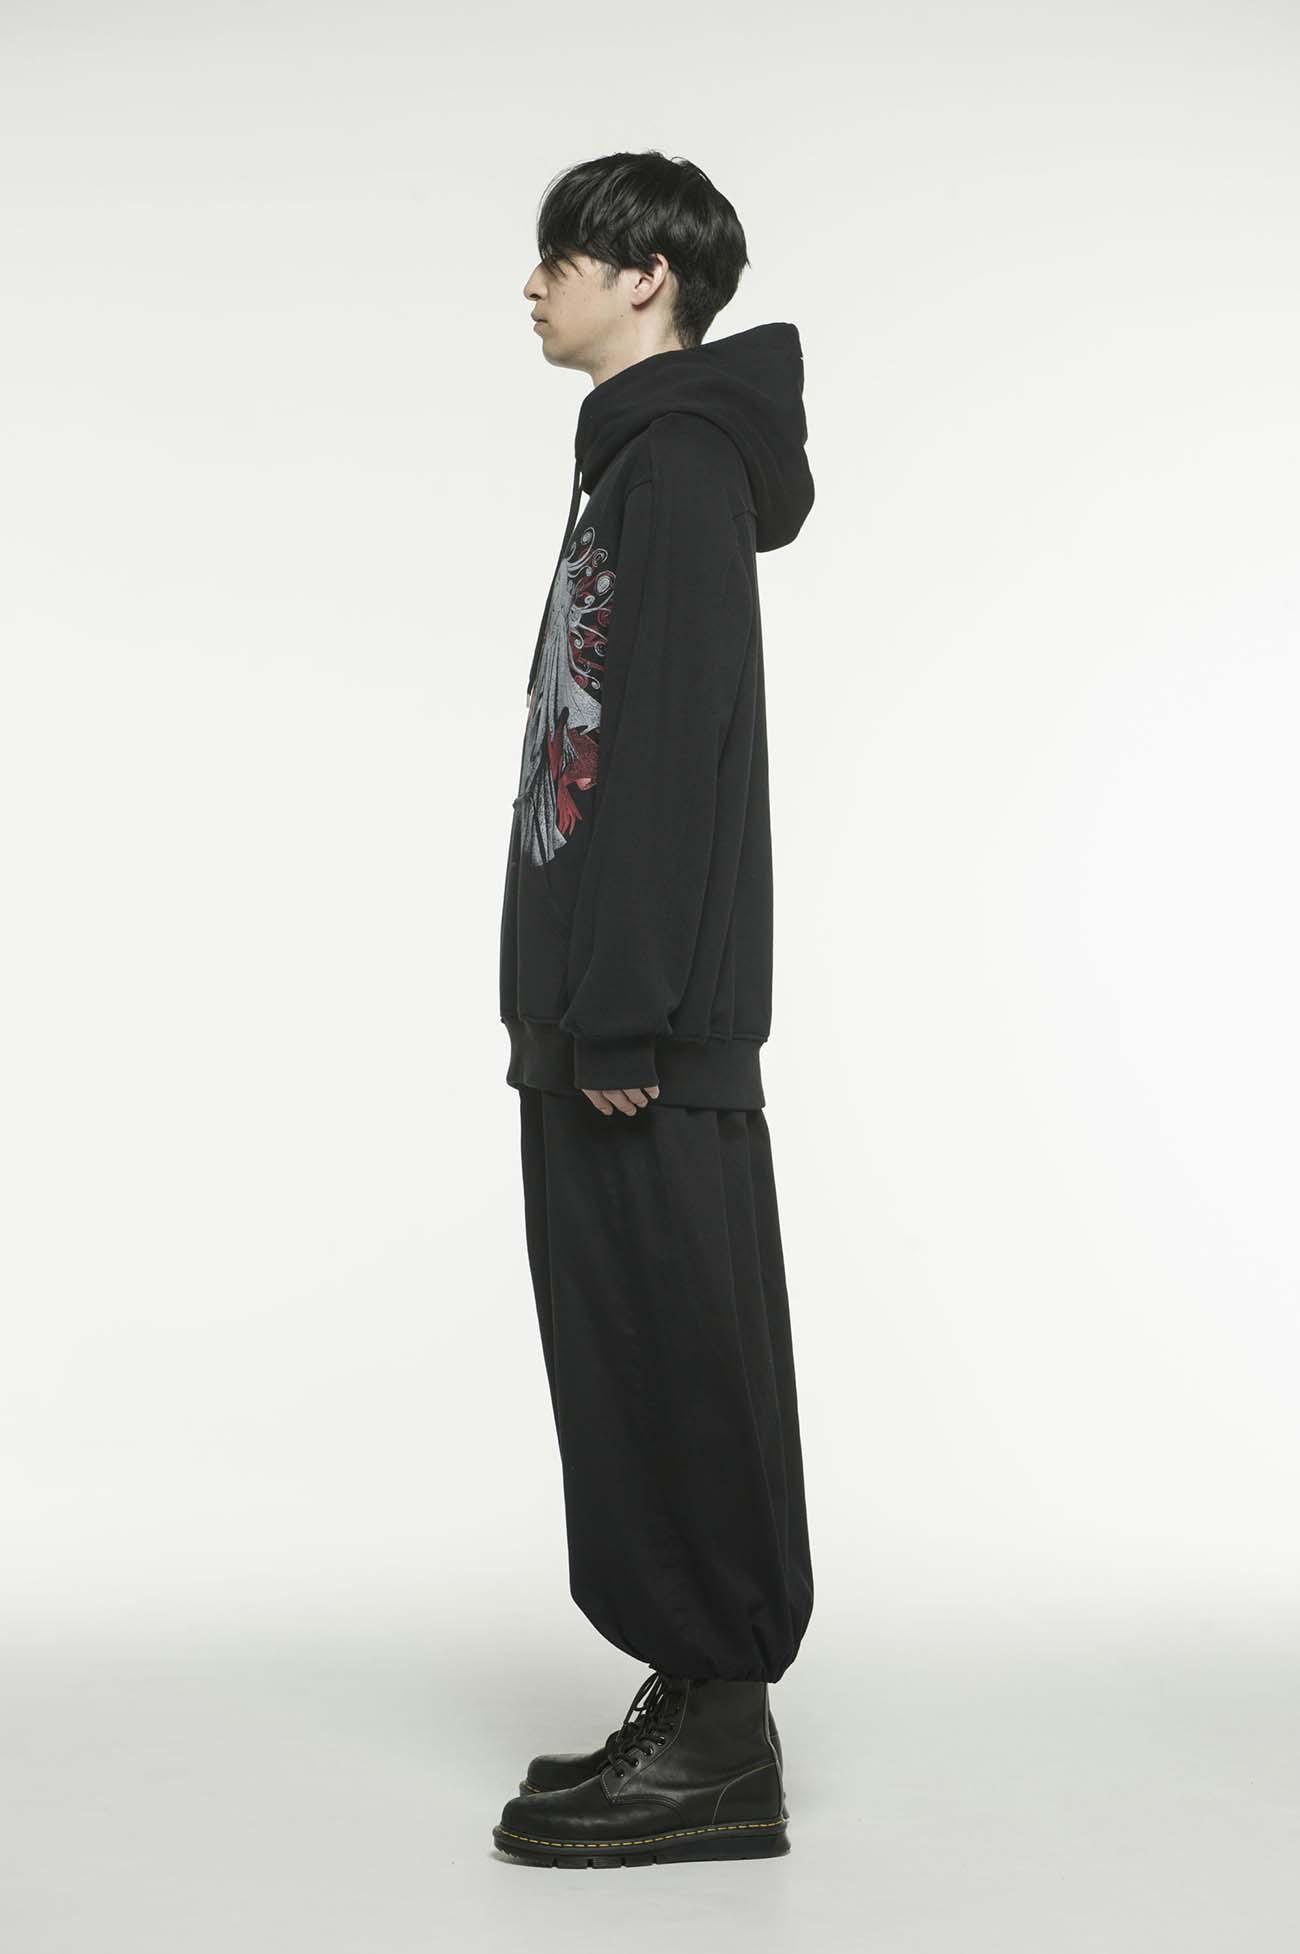 French Terry Stitch Work Kirie Uzumaki Wearing Yohji Yamamoto Hoodie